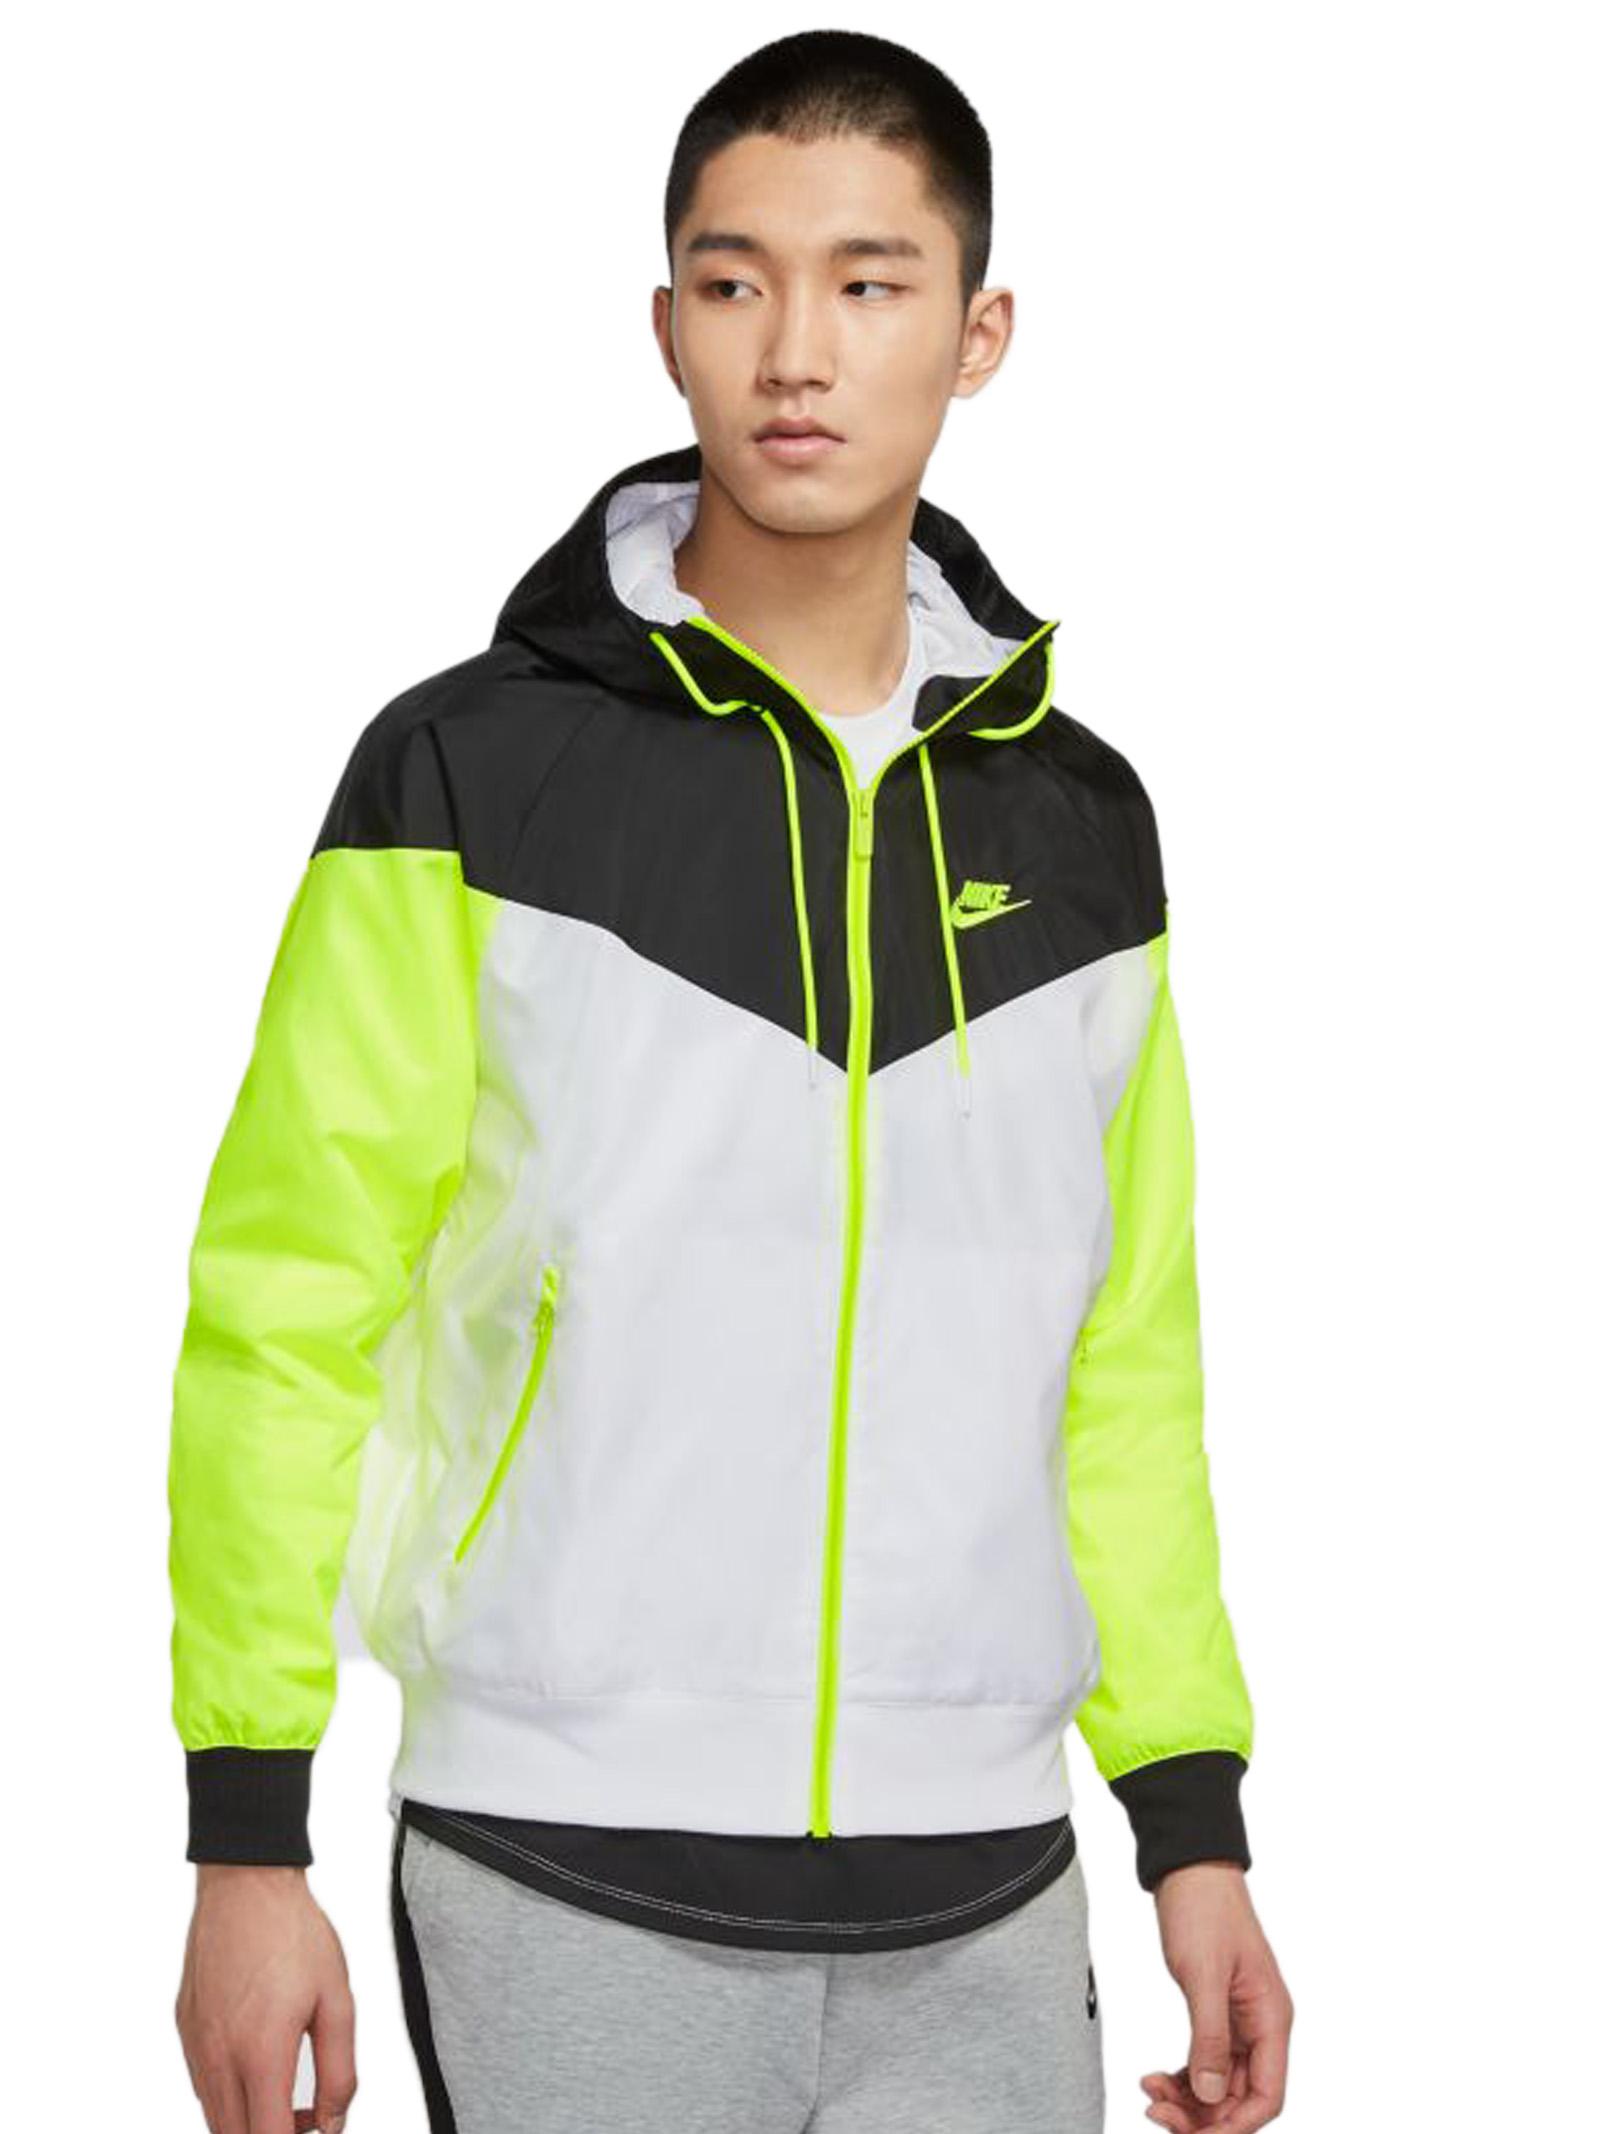 NIKE Giacca Sportswear Windrunner - NIKE - Citysport